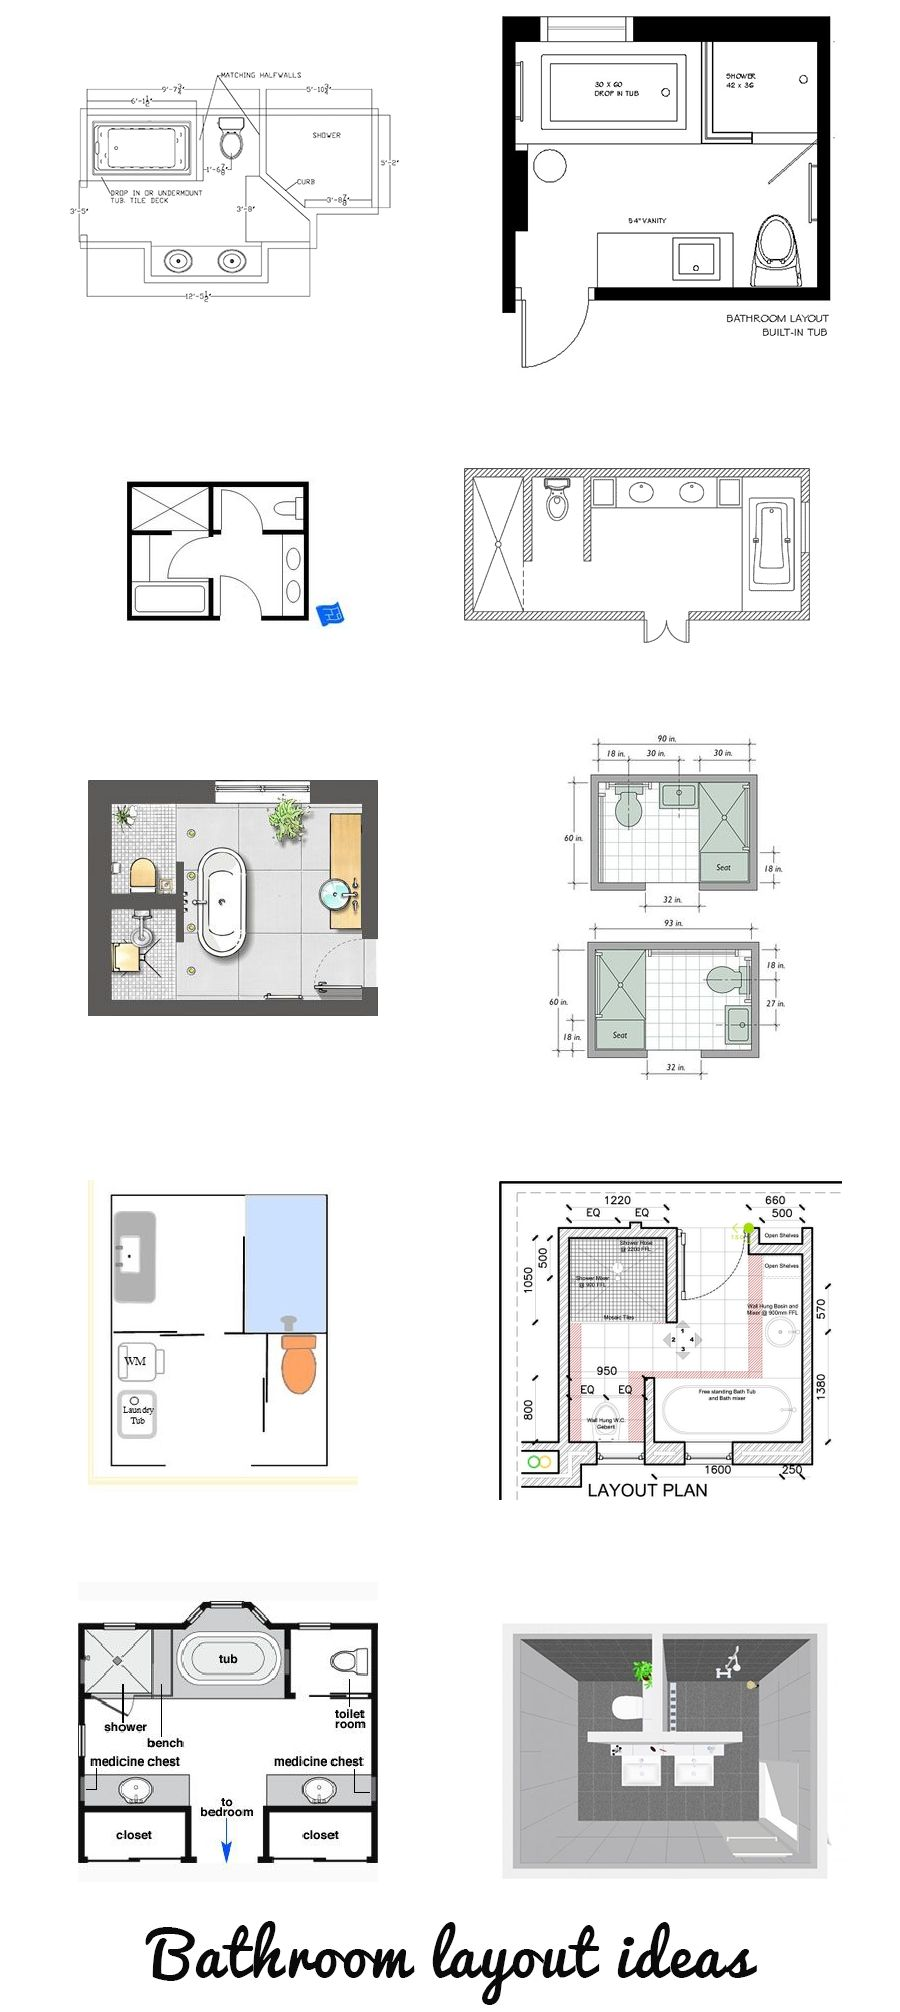 Most Amazing 12 Insanely Beautiful Bathroom Layout Ideas Australia Ij09w2 Https Ijcar 2016 Bathroom Design Layout Small Bathroom Layout Bathroom Floor Plans